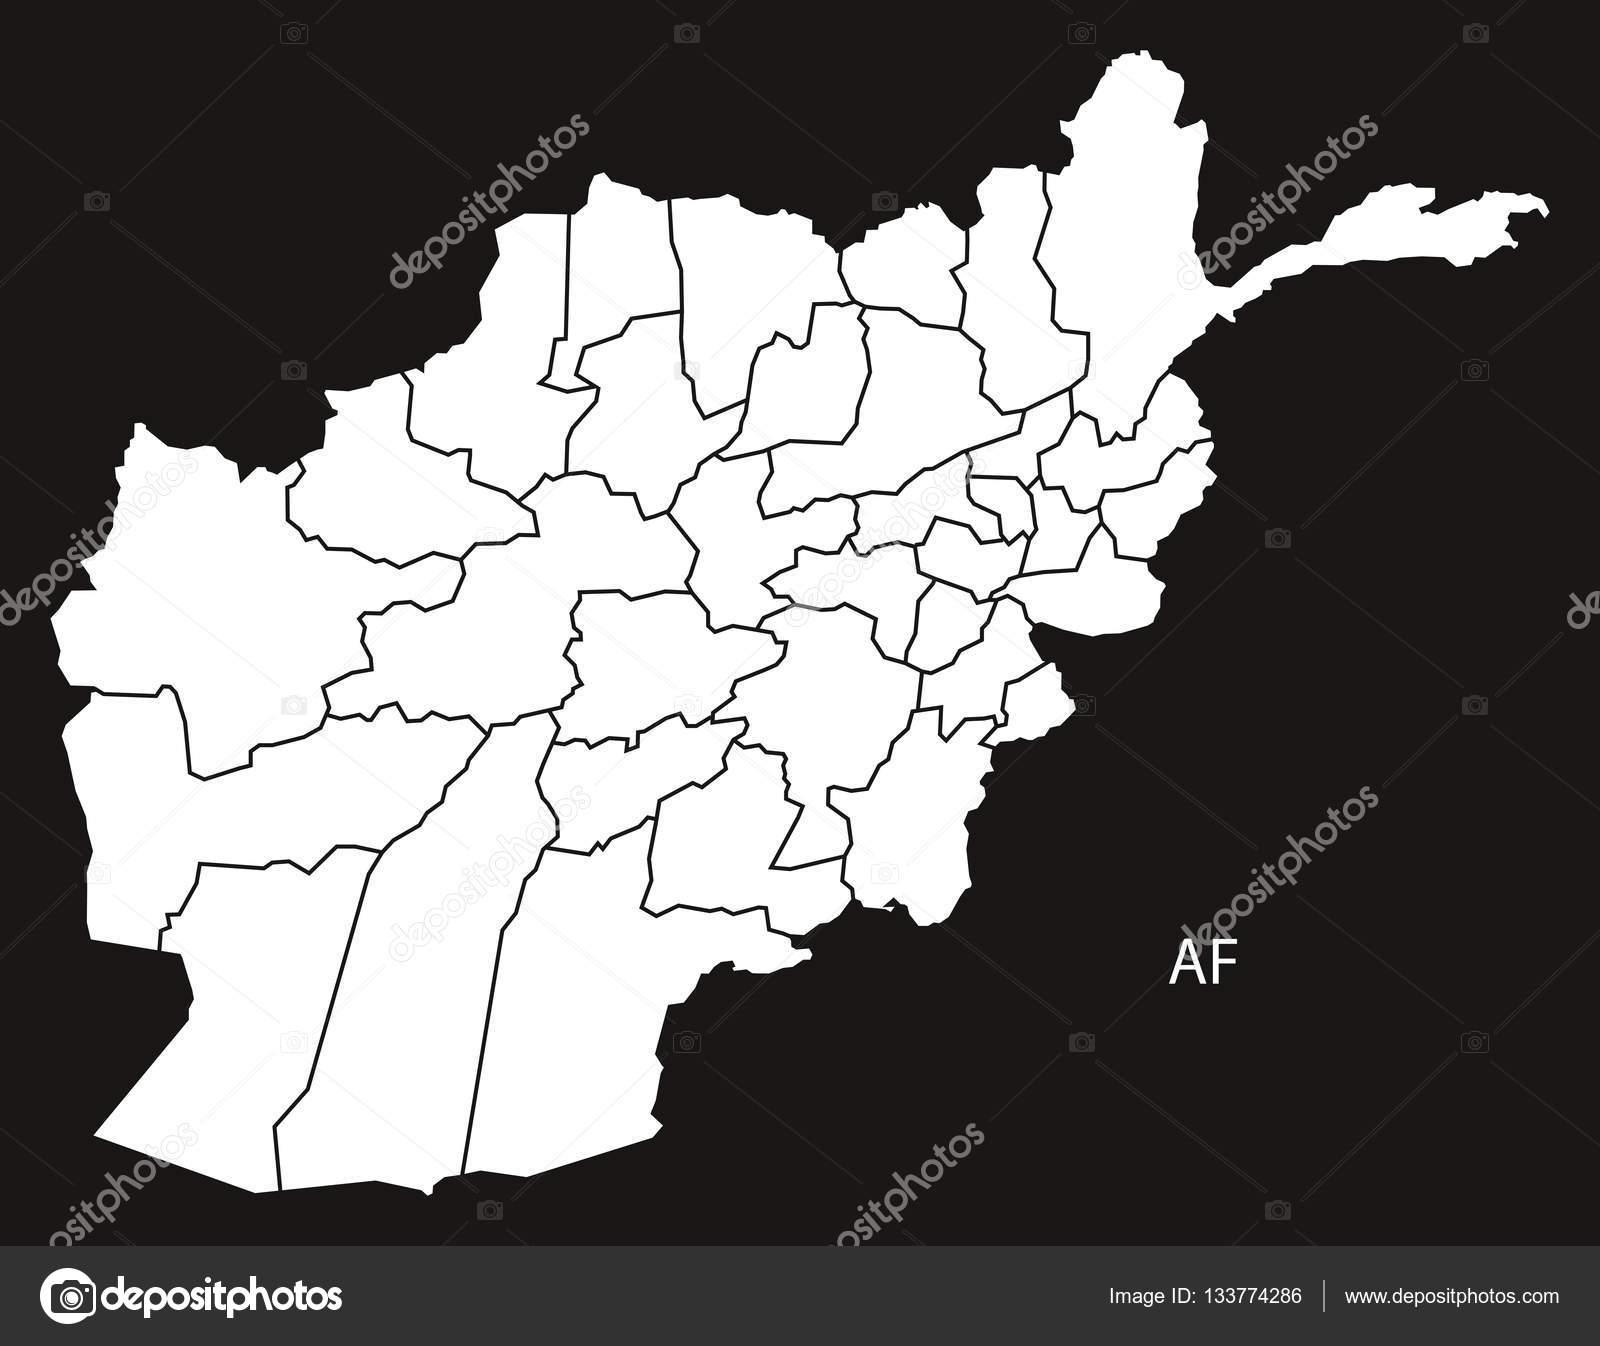 Karte Afghanistan Provinzen.Afghanistan Provinzen Karte Schwarz Weiss Stockvektor